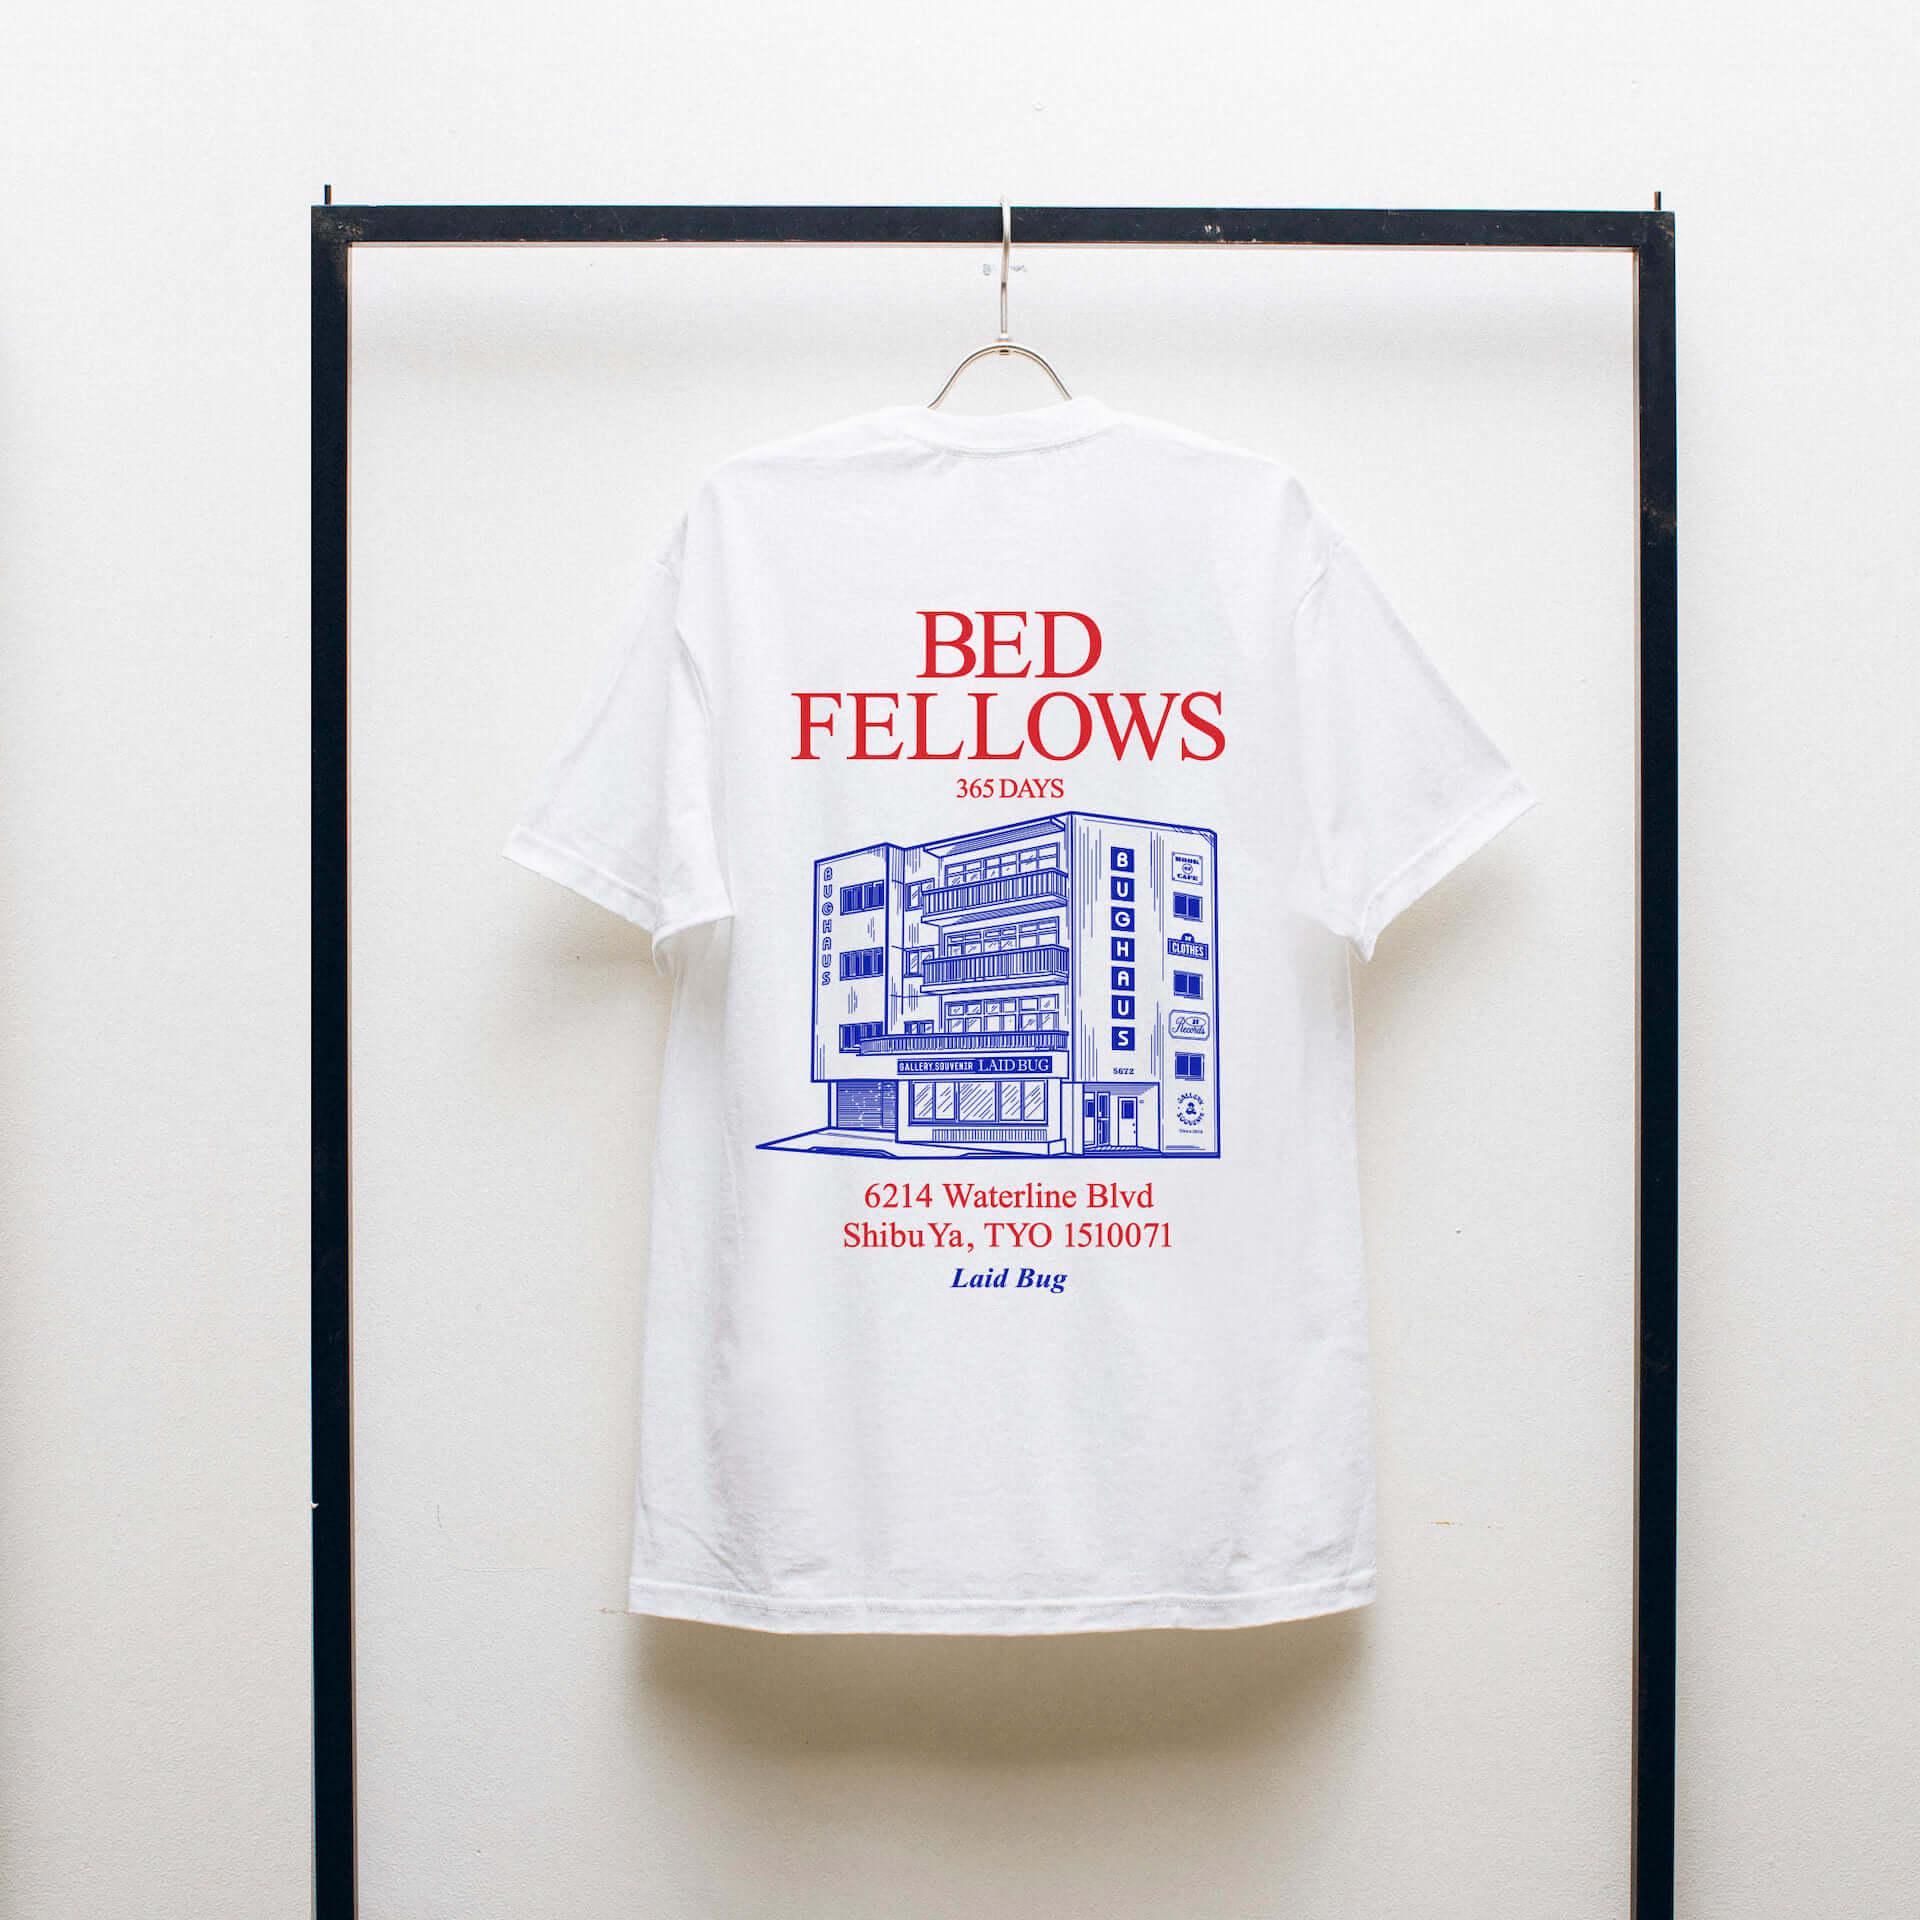 LAID BUGによる期間限定ポップアップショップが福岡の六本松 蔦屋書店「吉嗣商店」にて開催決定! art210330_laidbug_6-1920x1920